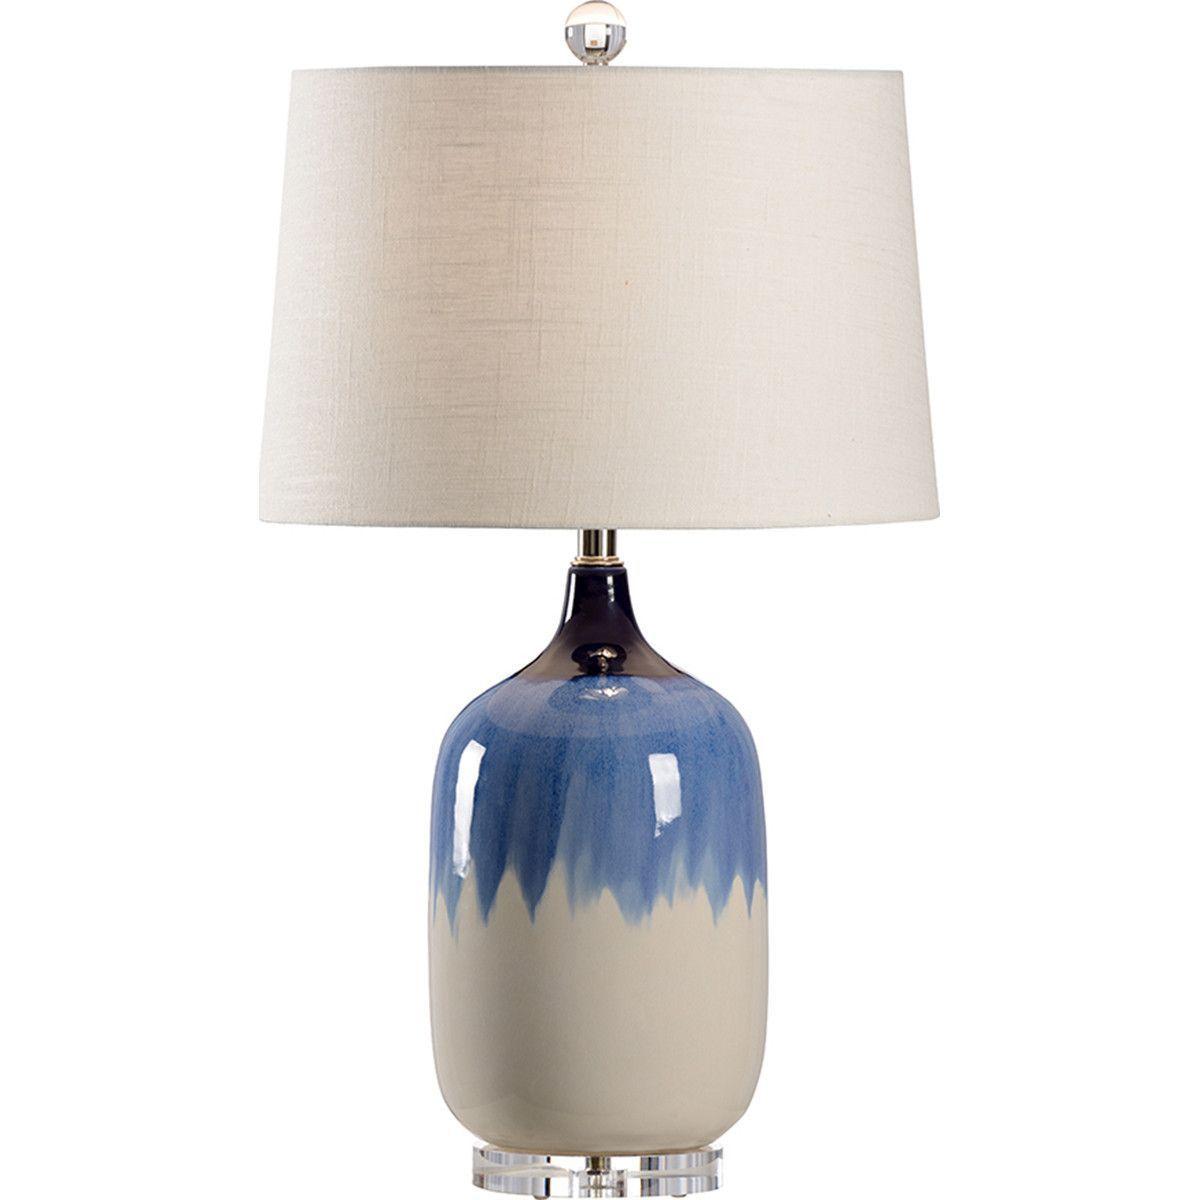 Wildwood Cascade Cobalt Lamp | Cobalt and Products